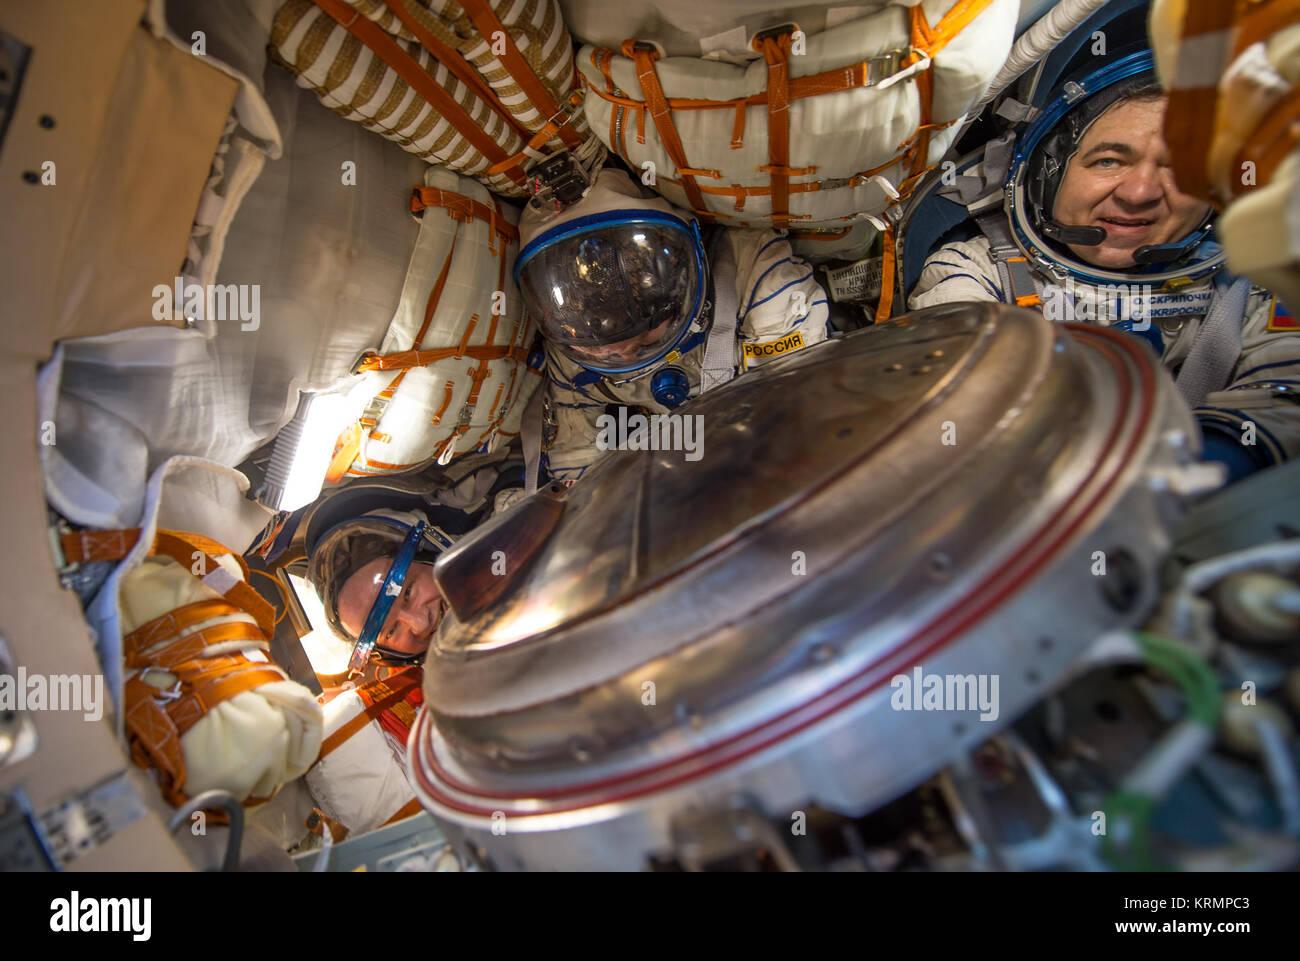 NASA astronaut Jeff Williams, left, Russian cosmonaut Alexey Ovchinin of Roscosmos, center, and Russian cosmonaut - Stock Image